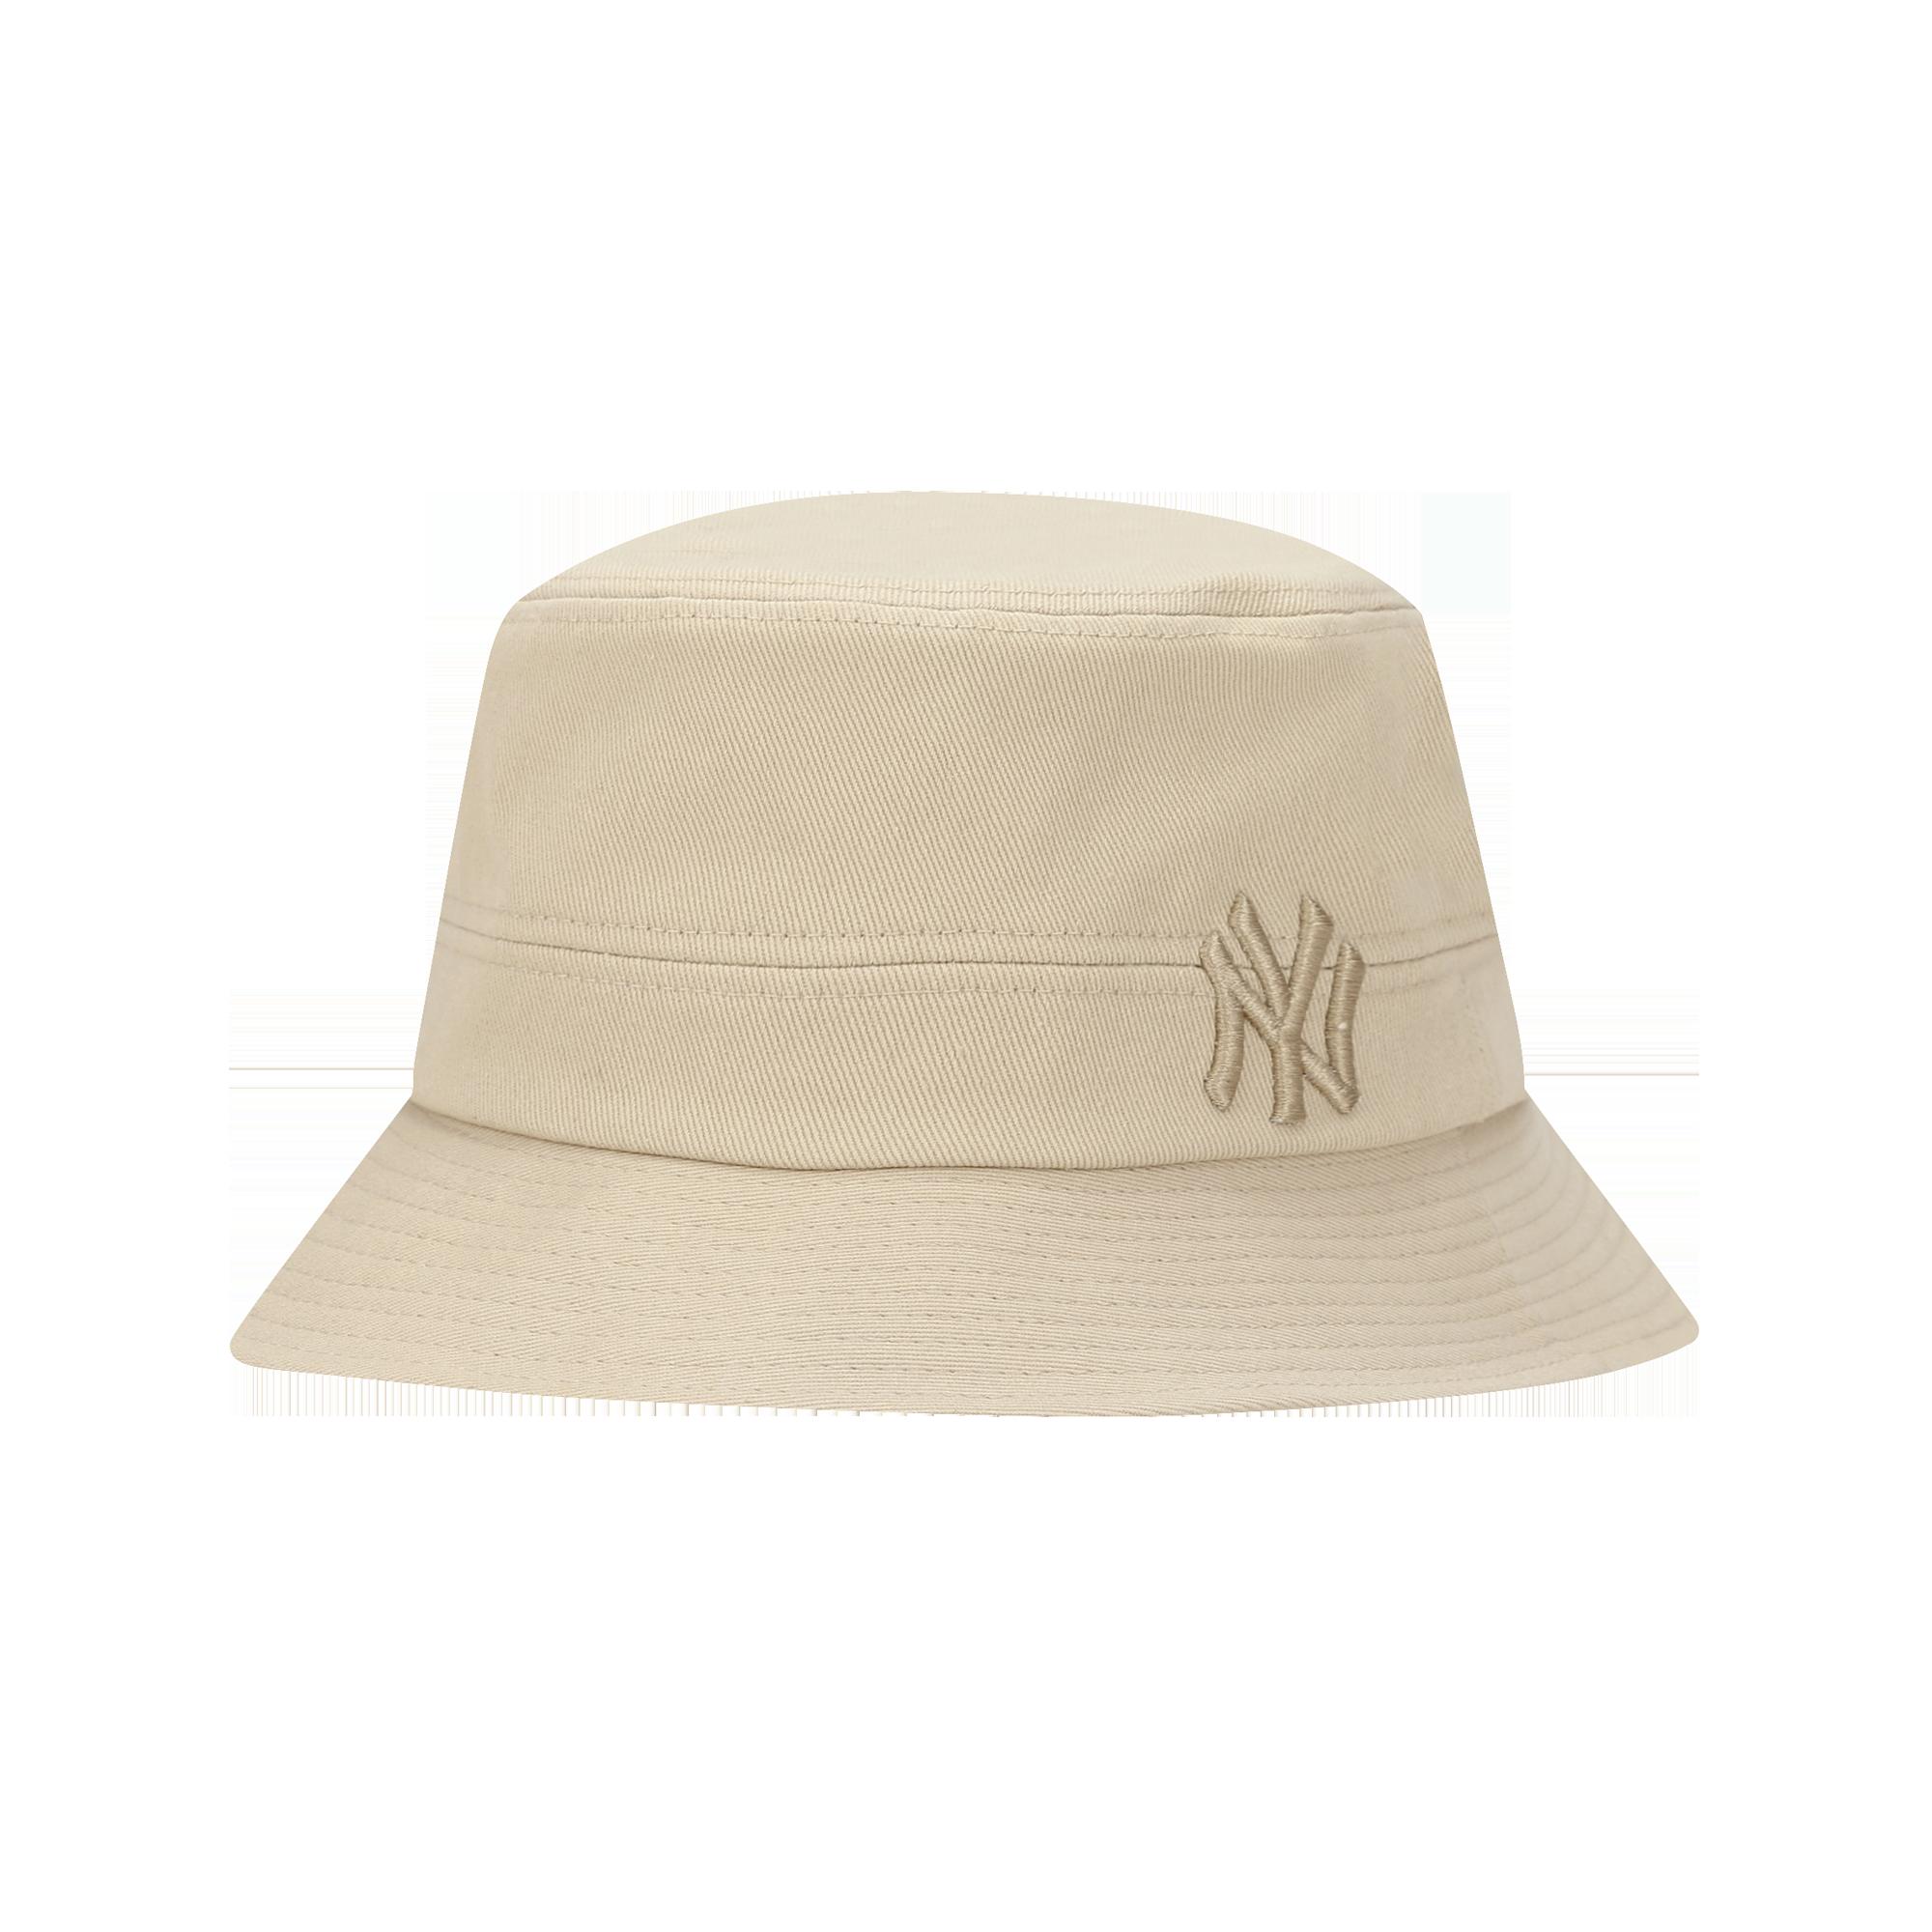 NEW YORK YANKEES SHADOW BUCKET HAT